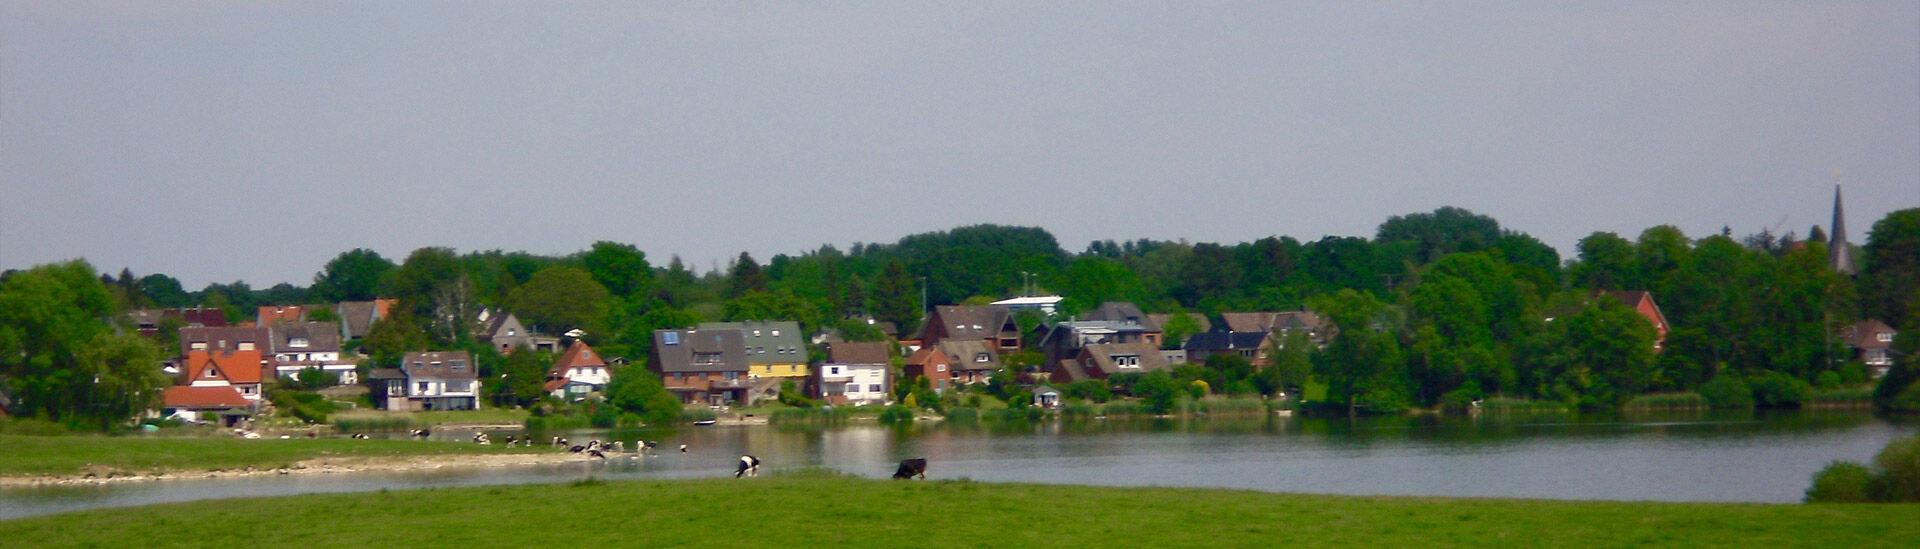 Blick auf die Dorflage am Bothkamper See